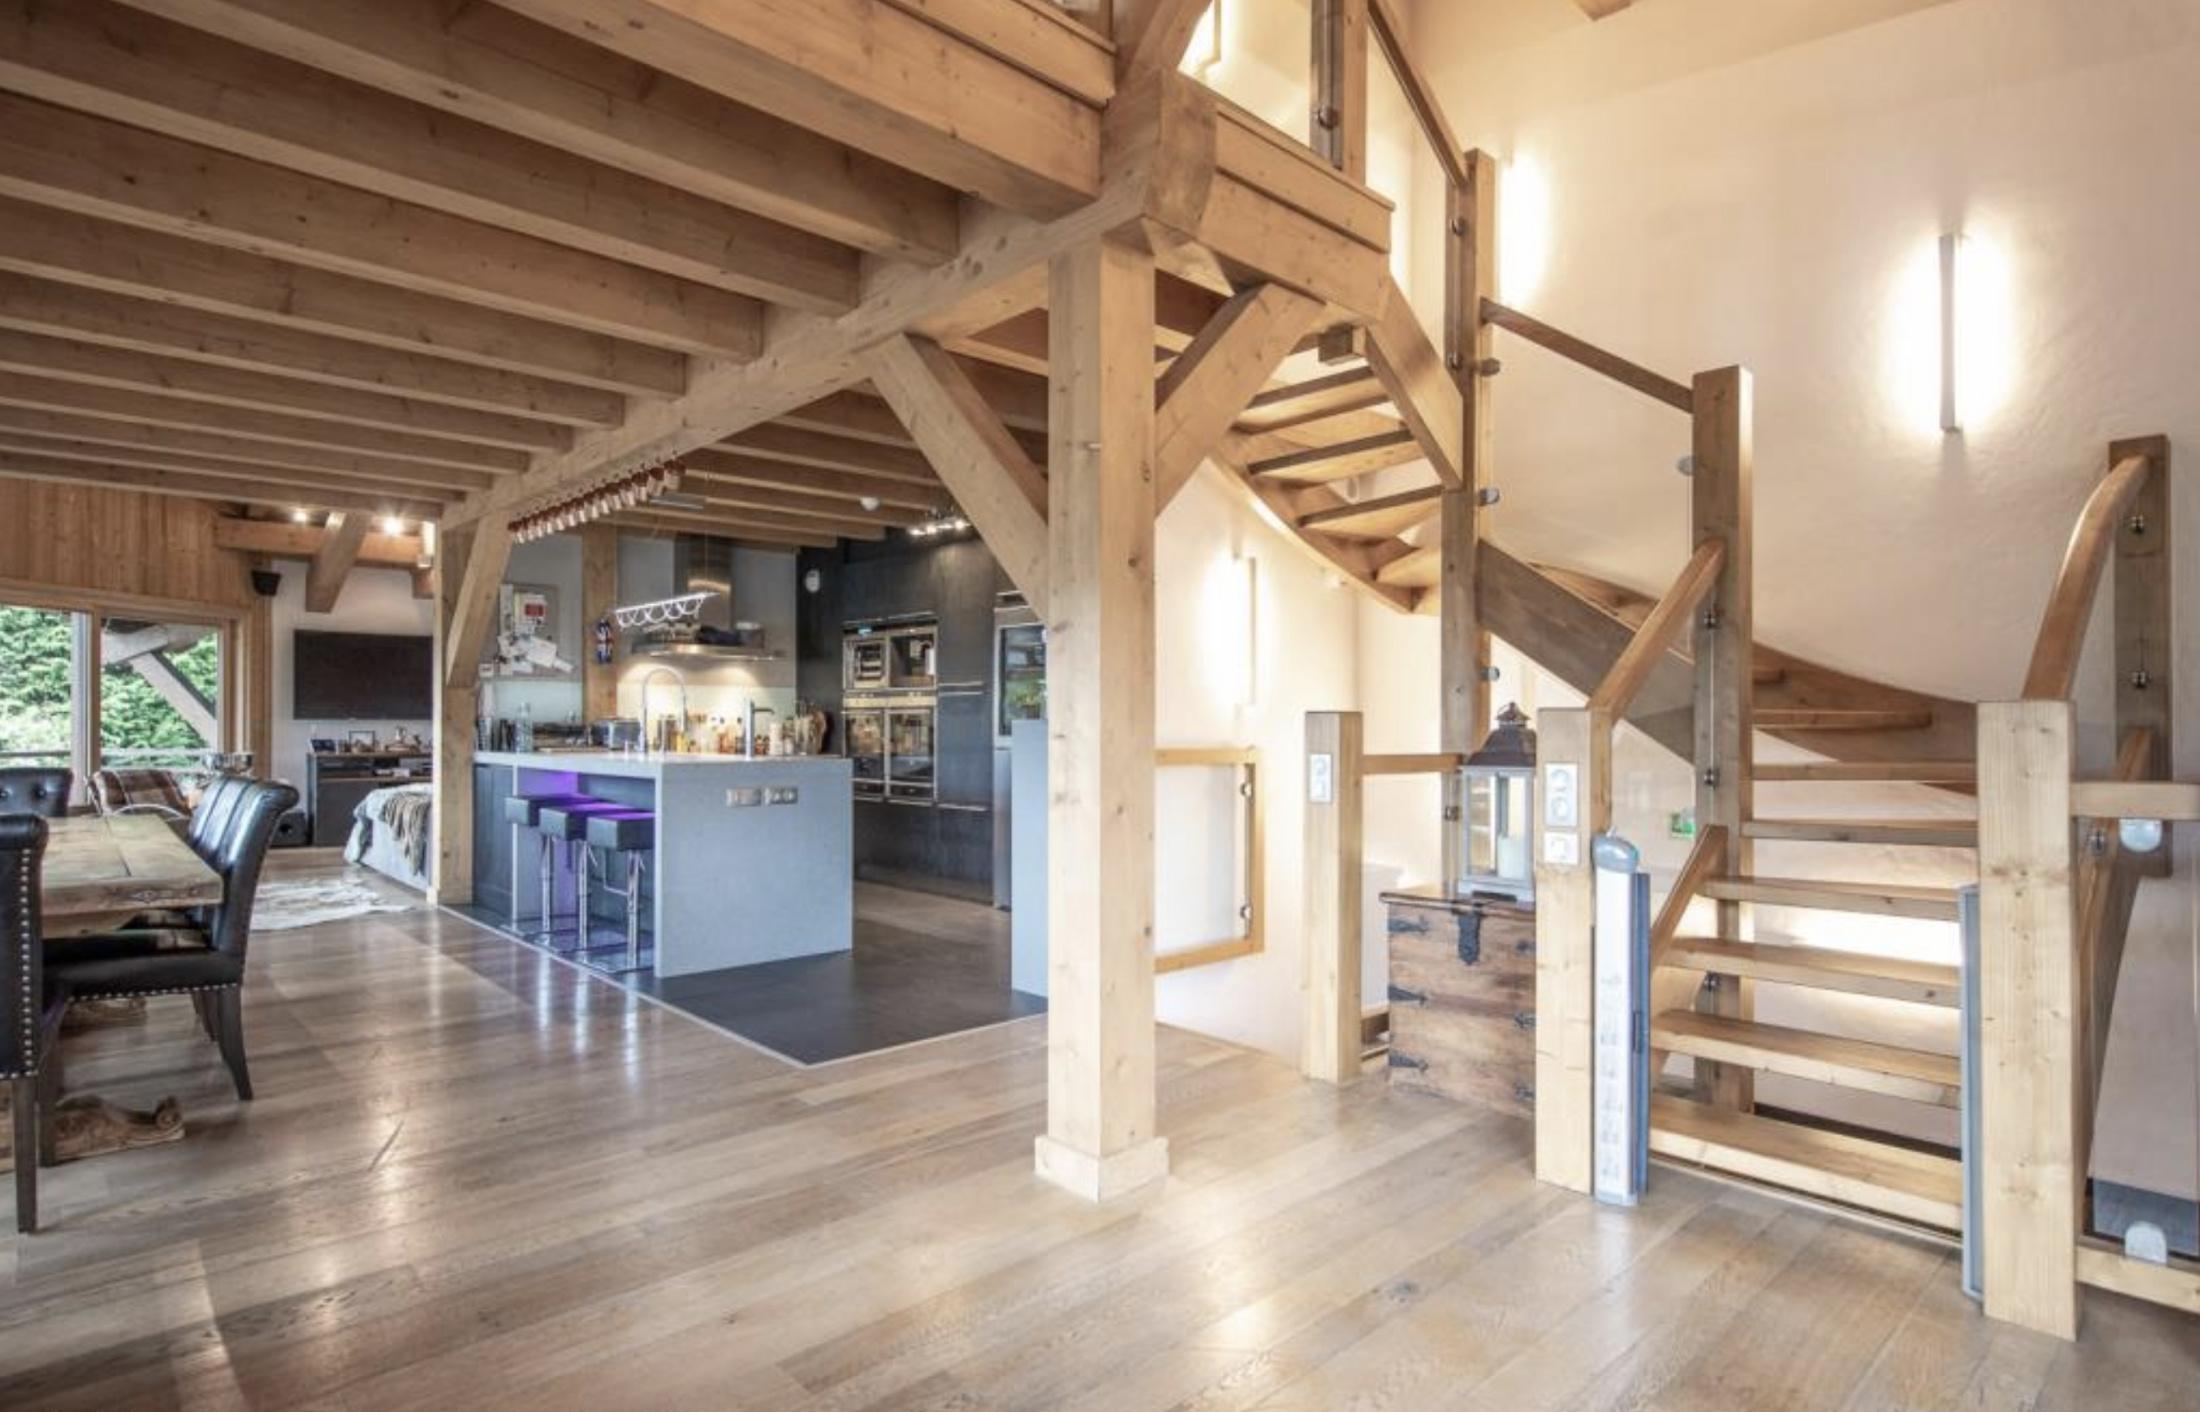 Luxury Real Estate in Morzine France